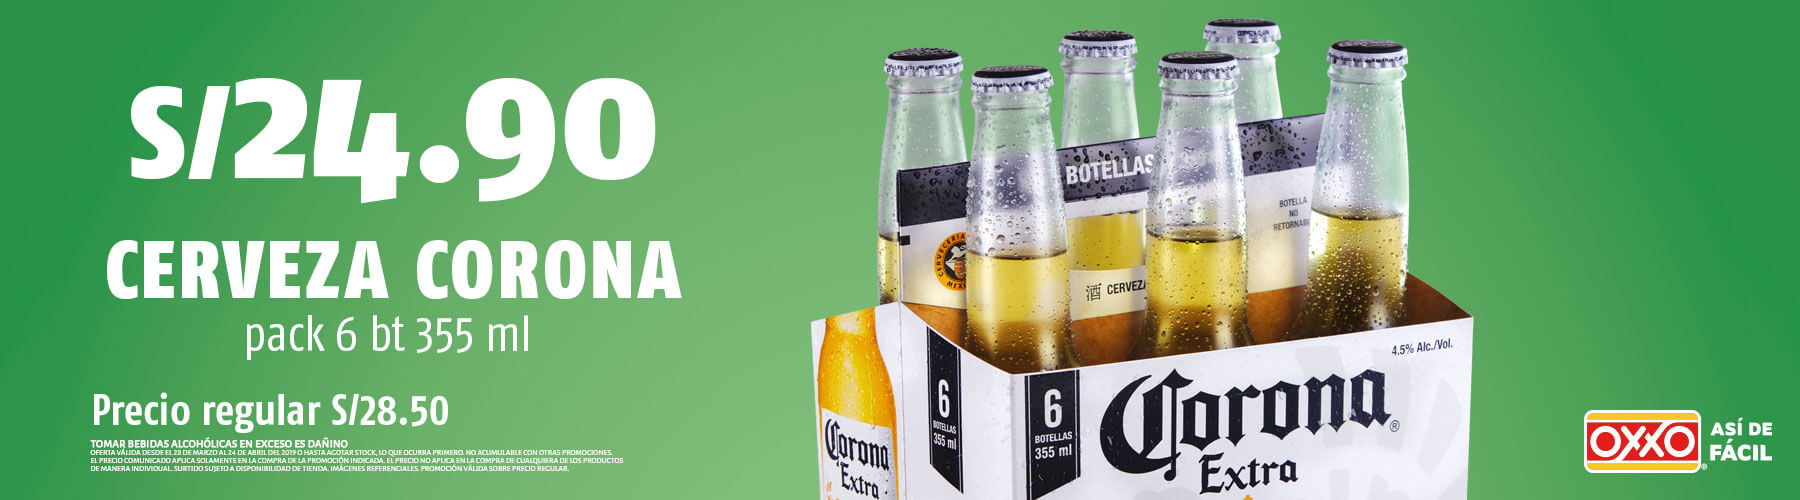 Promocion Cerveza Corona